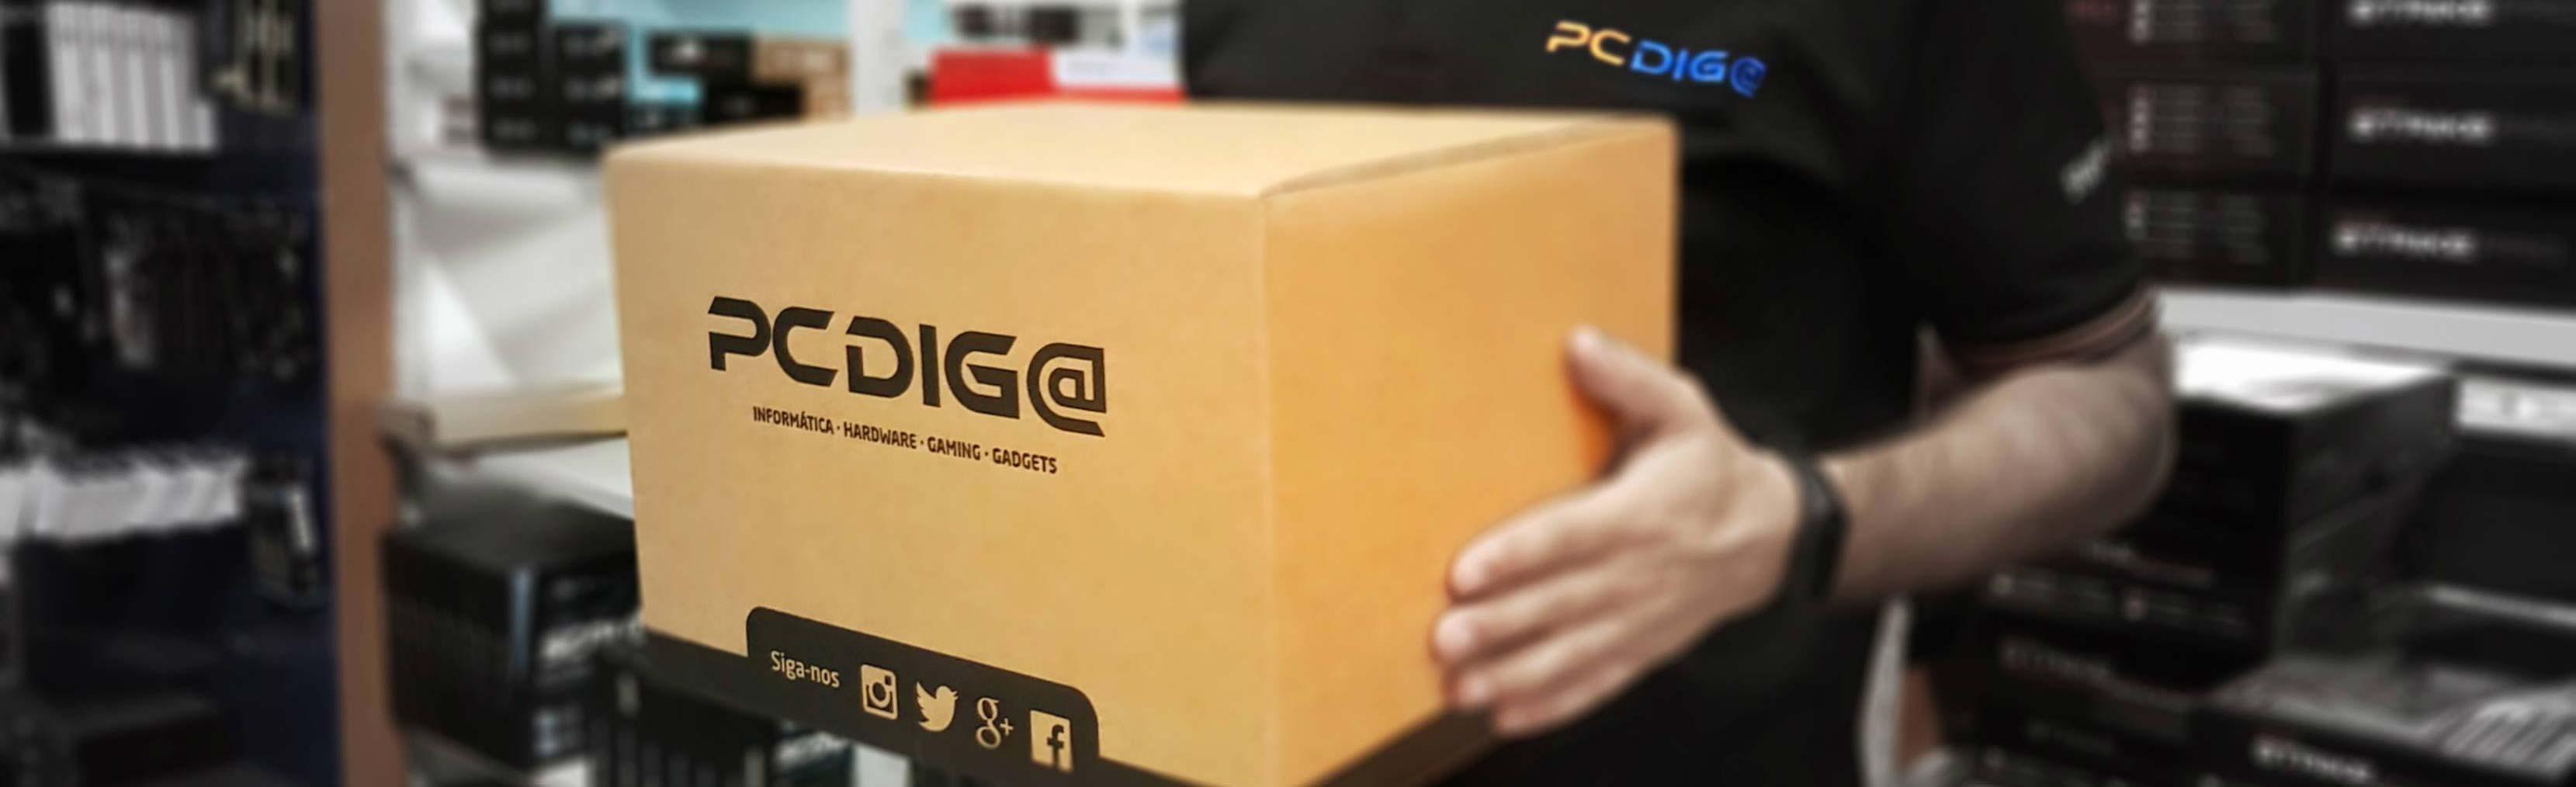 PCDiga Case Study